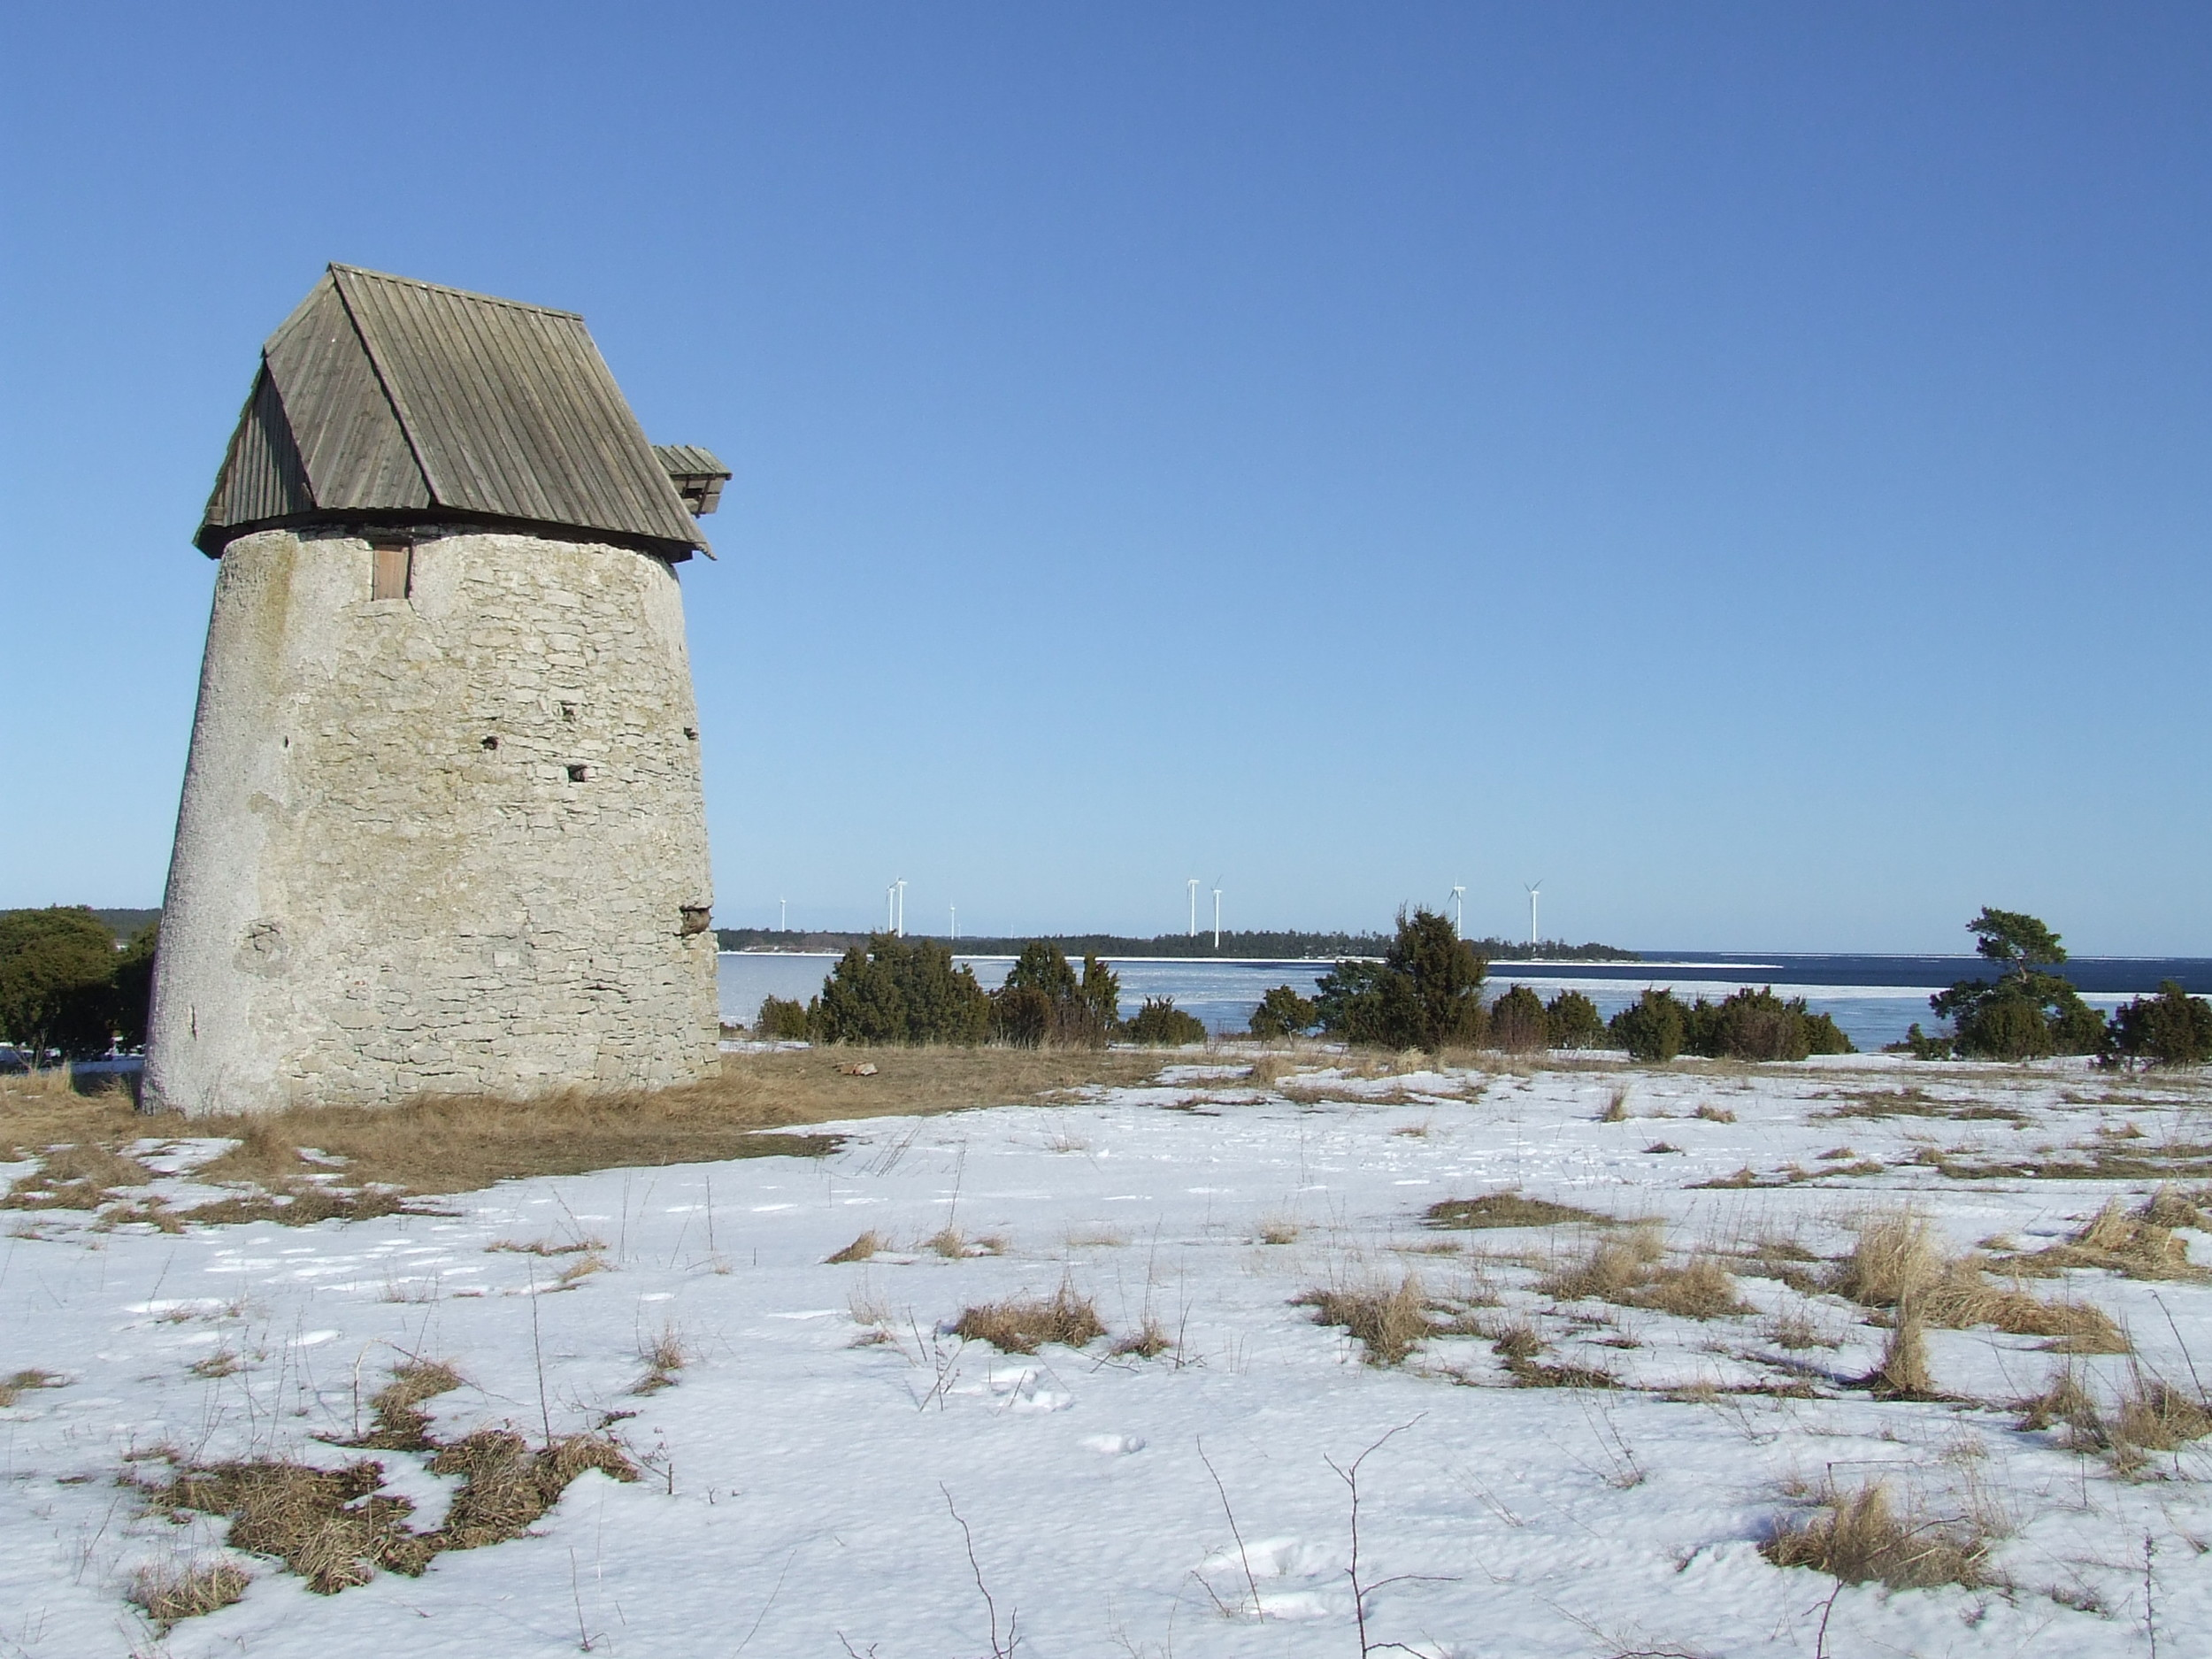 Väderkvarn vid S:t olofsholm